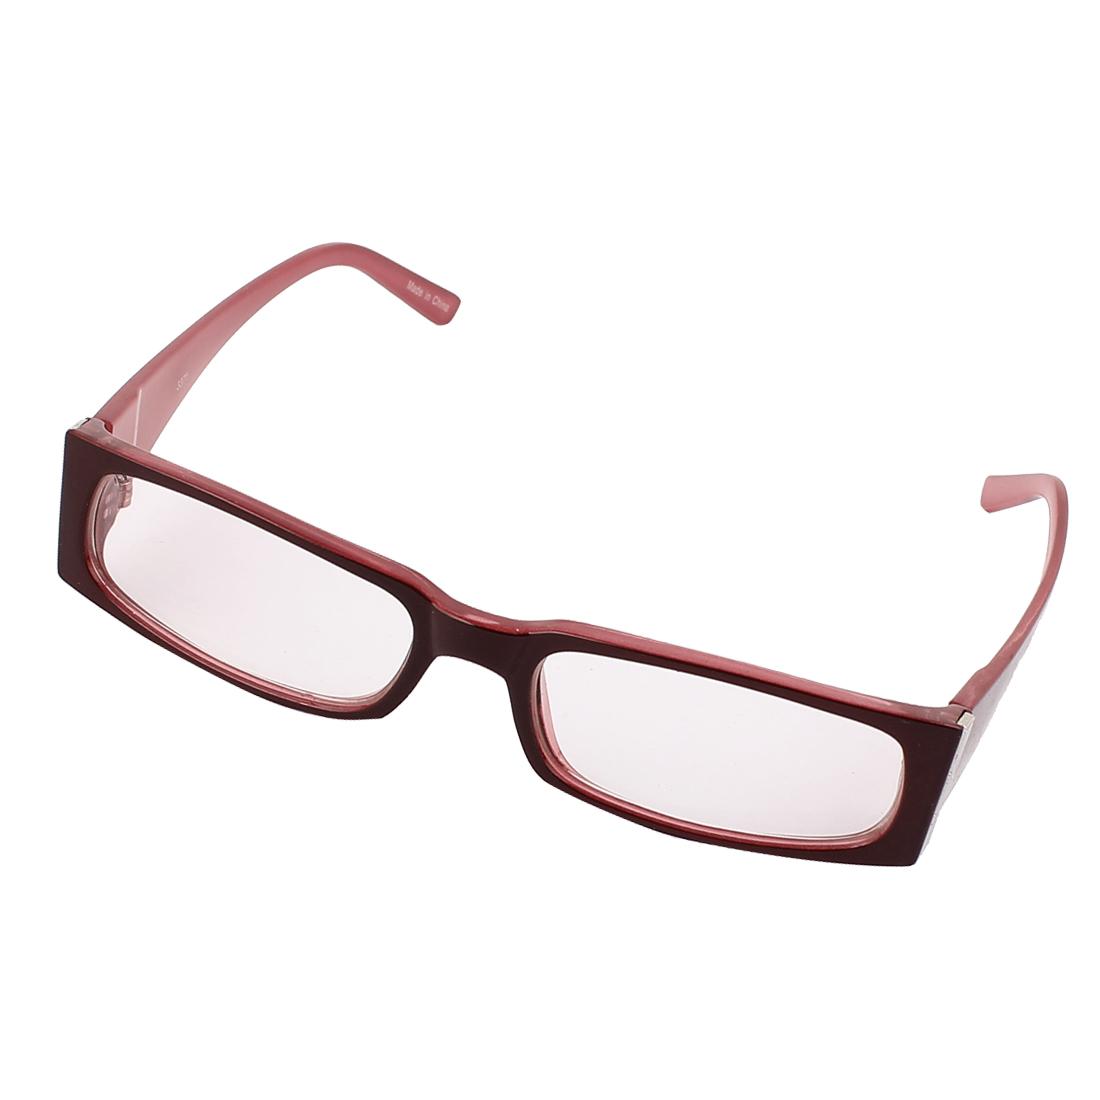 Women Full Rim Square Frame Spectacles Outdoor Eyeglasses Eyewear